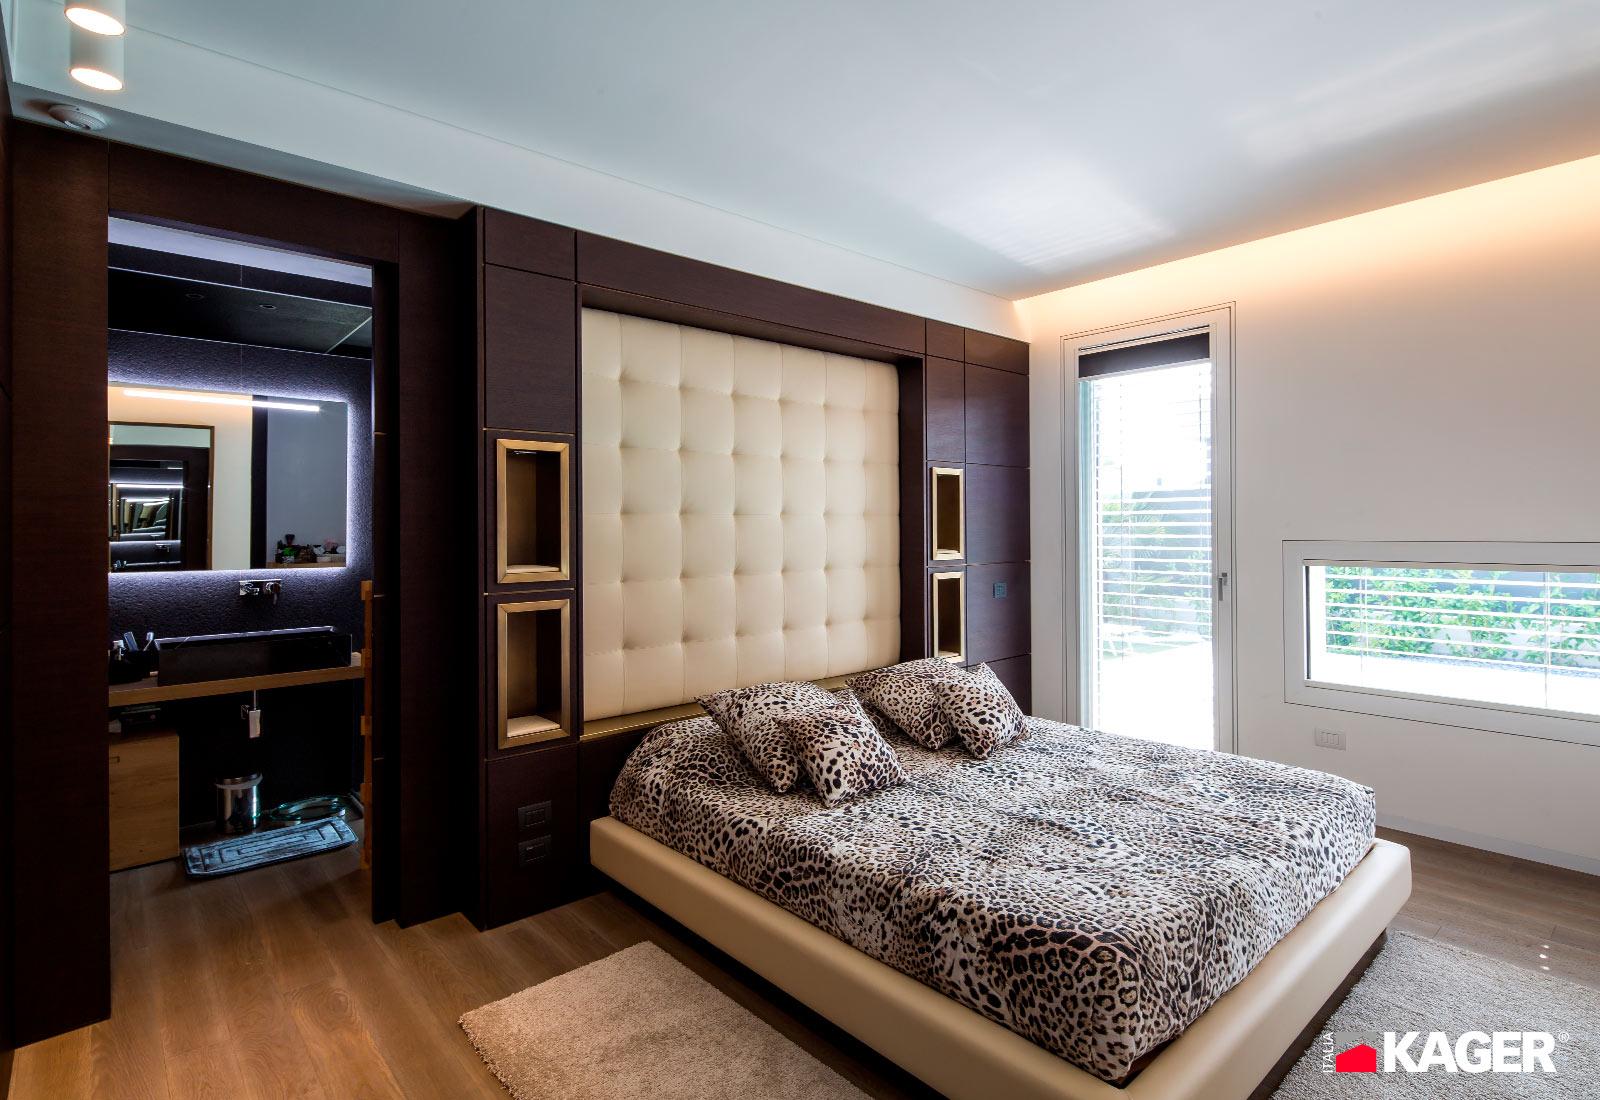 Casa-in-legno-Oppeano-Verona-Kager-Italia-11